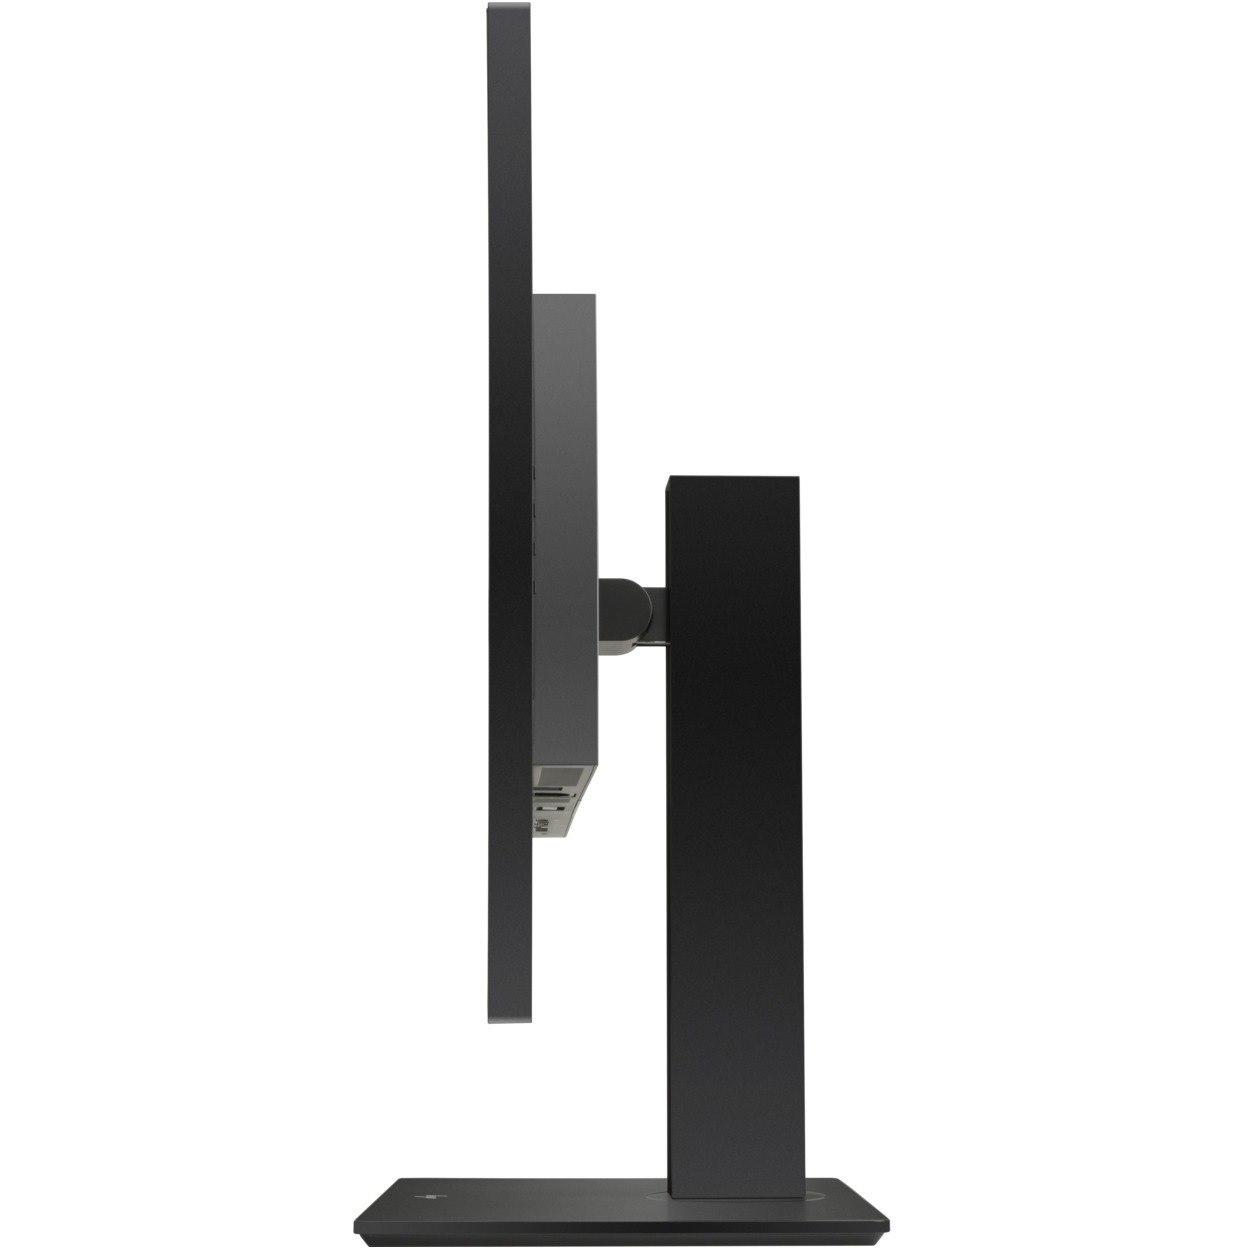 "HP Business Z32 80 cm (31.5"") 4K UHD LED LCD Monitor - 16:9 - Black"